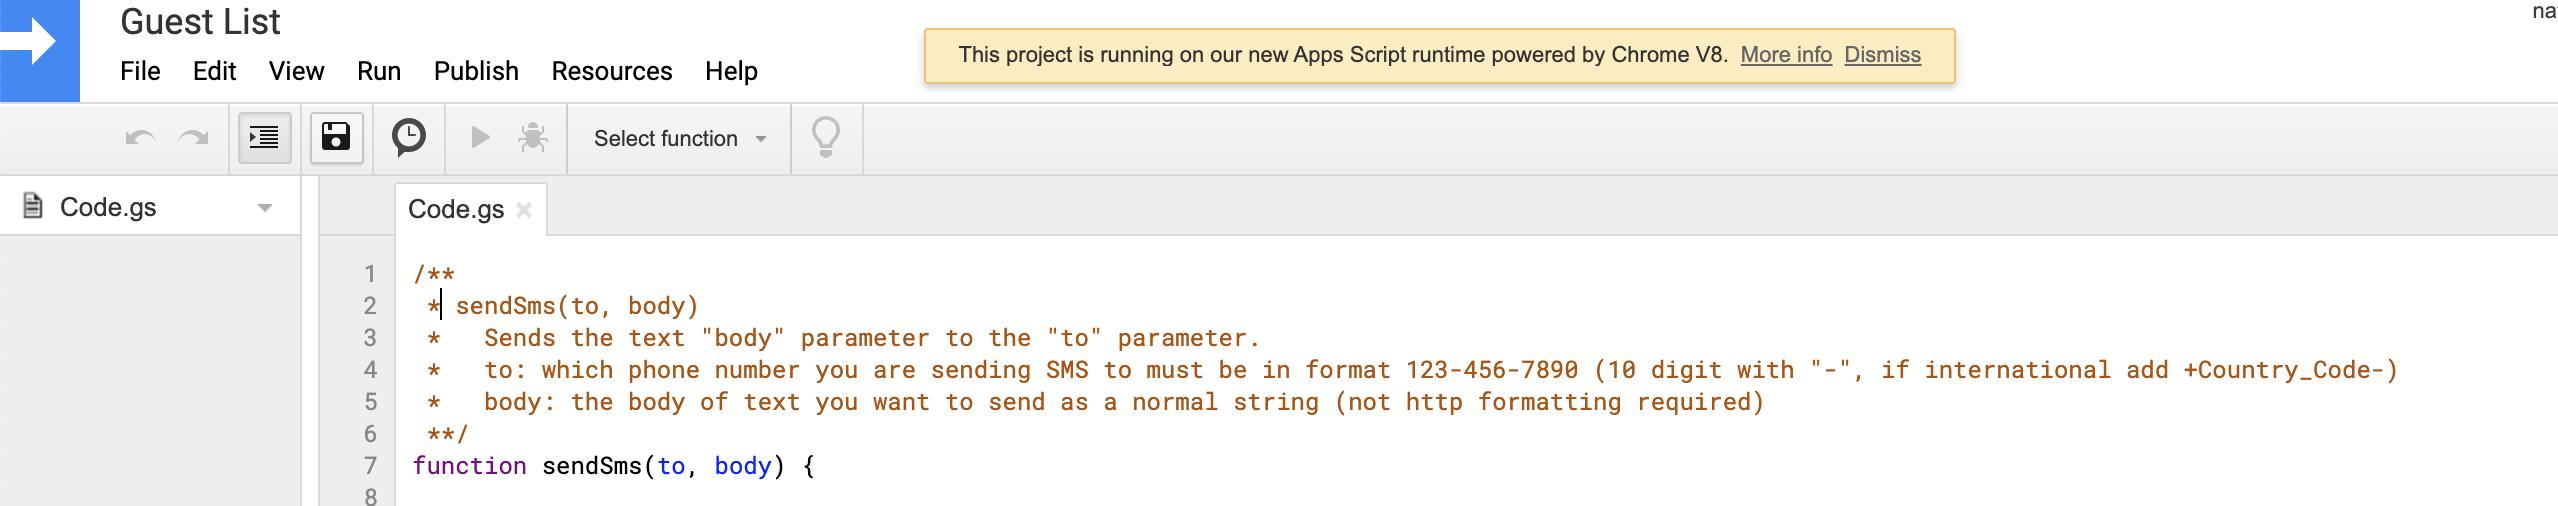 google-sheets-app-script-editor